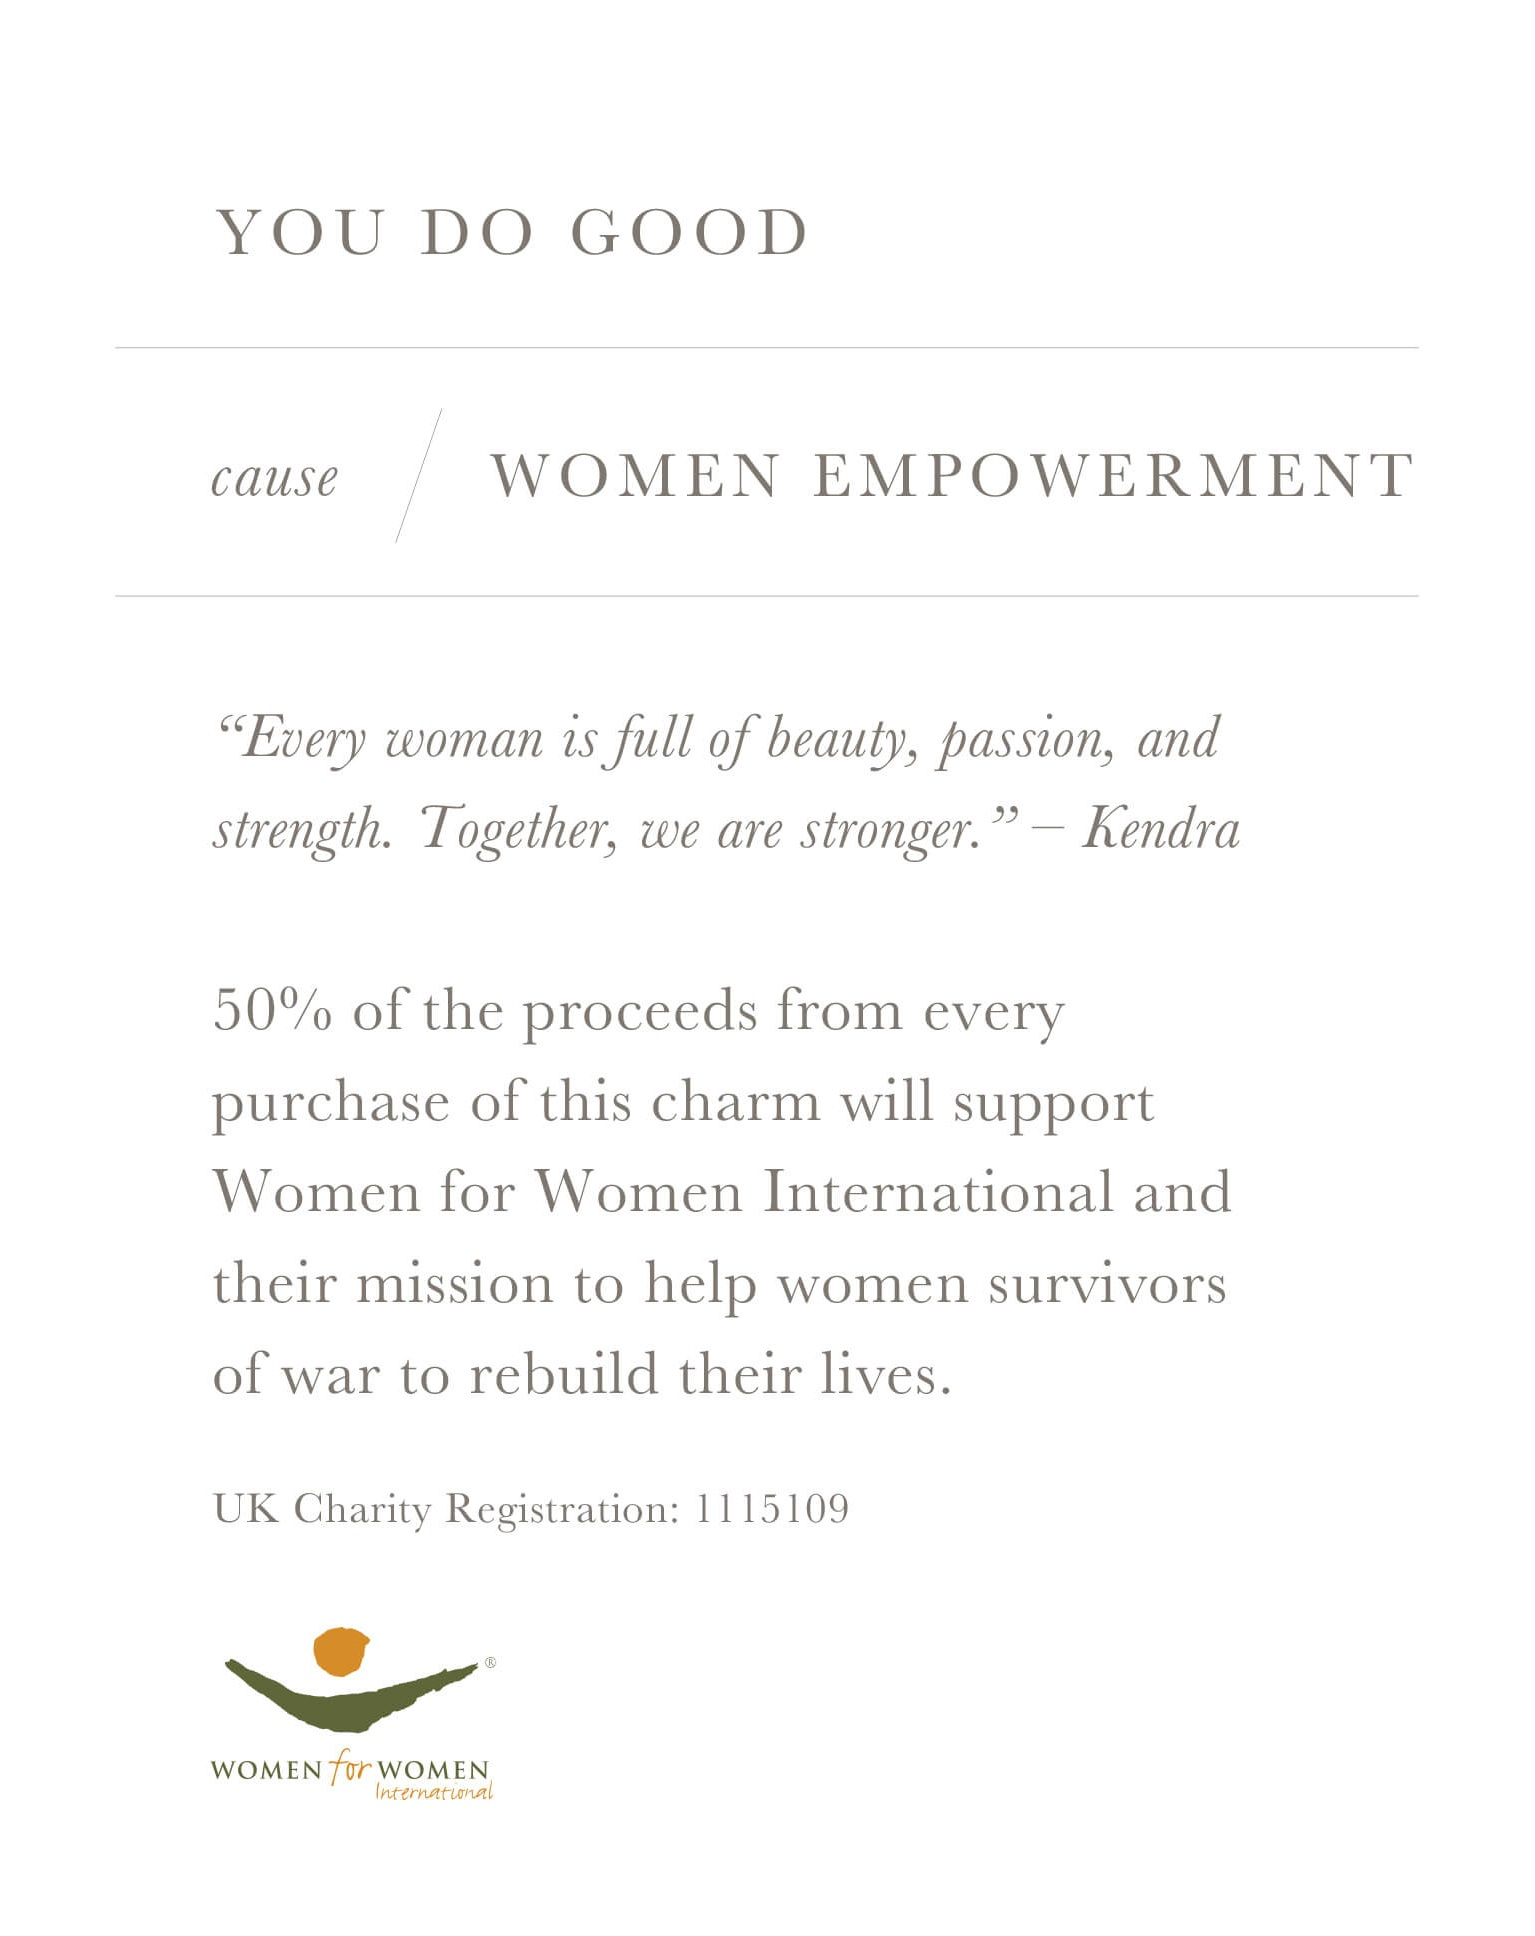 women-empowerment-story-card-lg.jpg